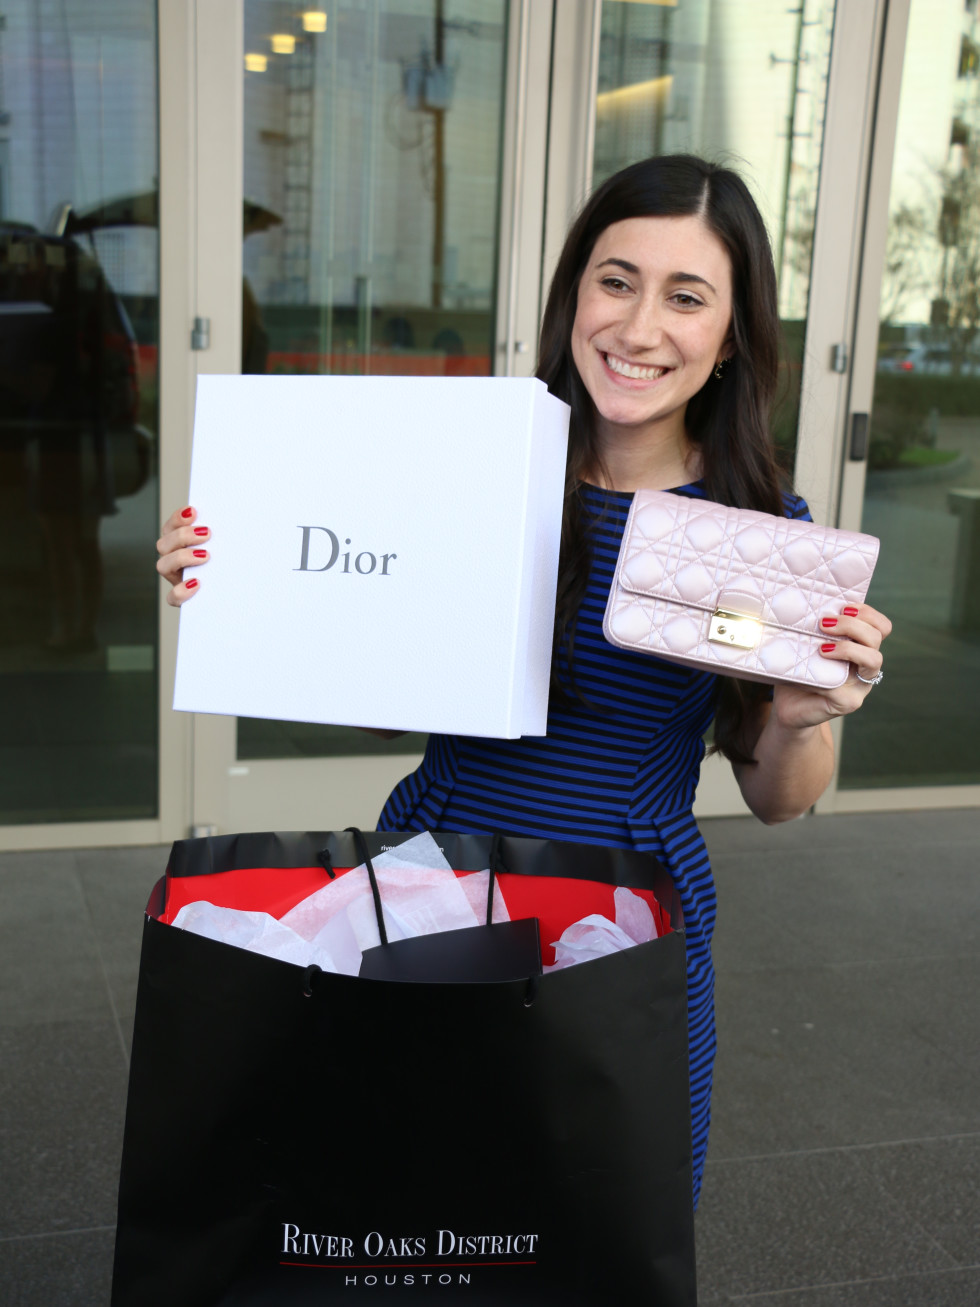 Dior winner in Uber promotion